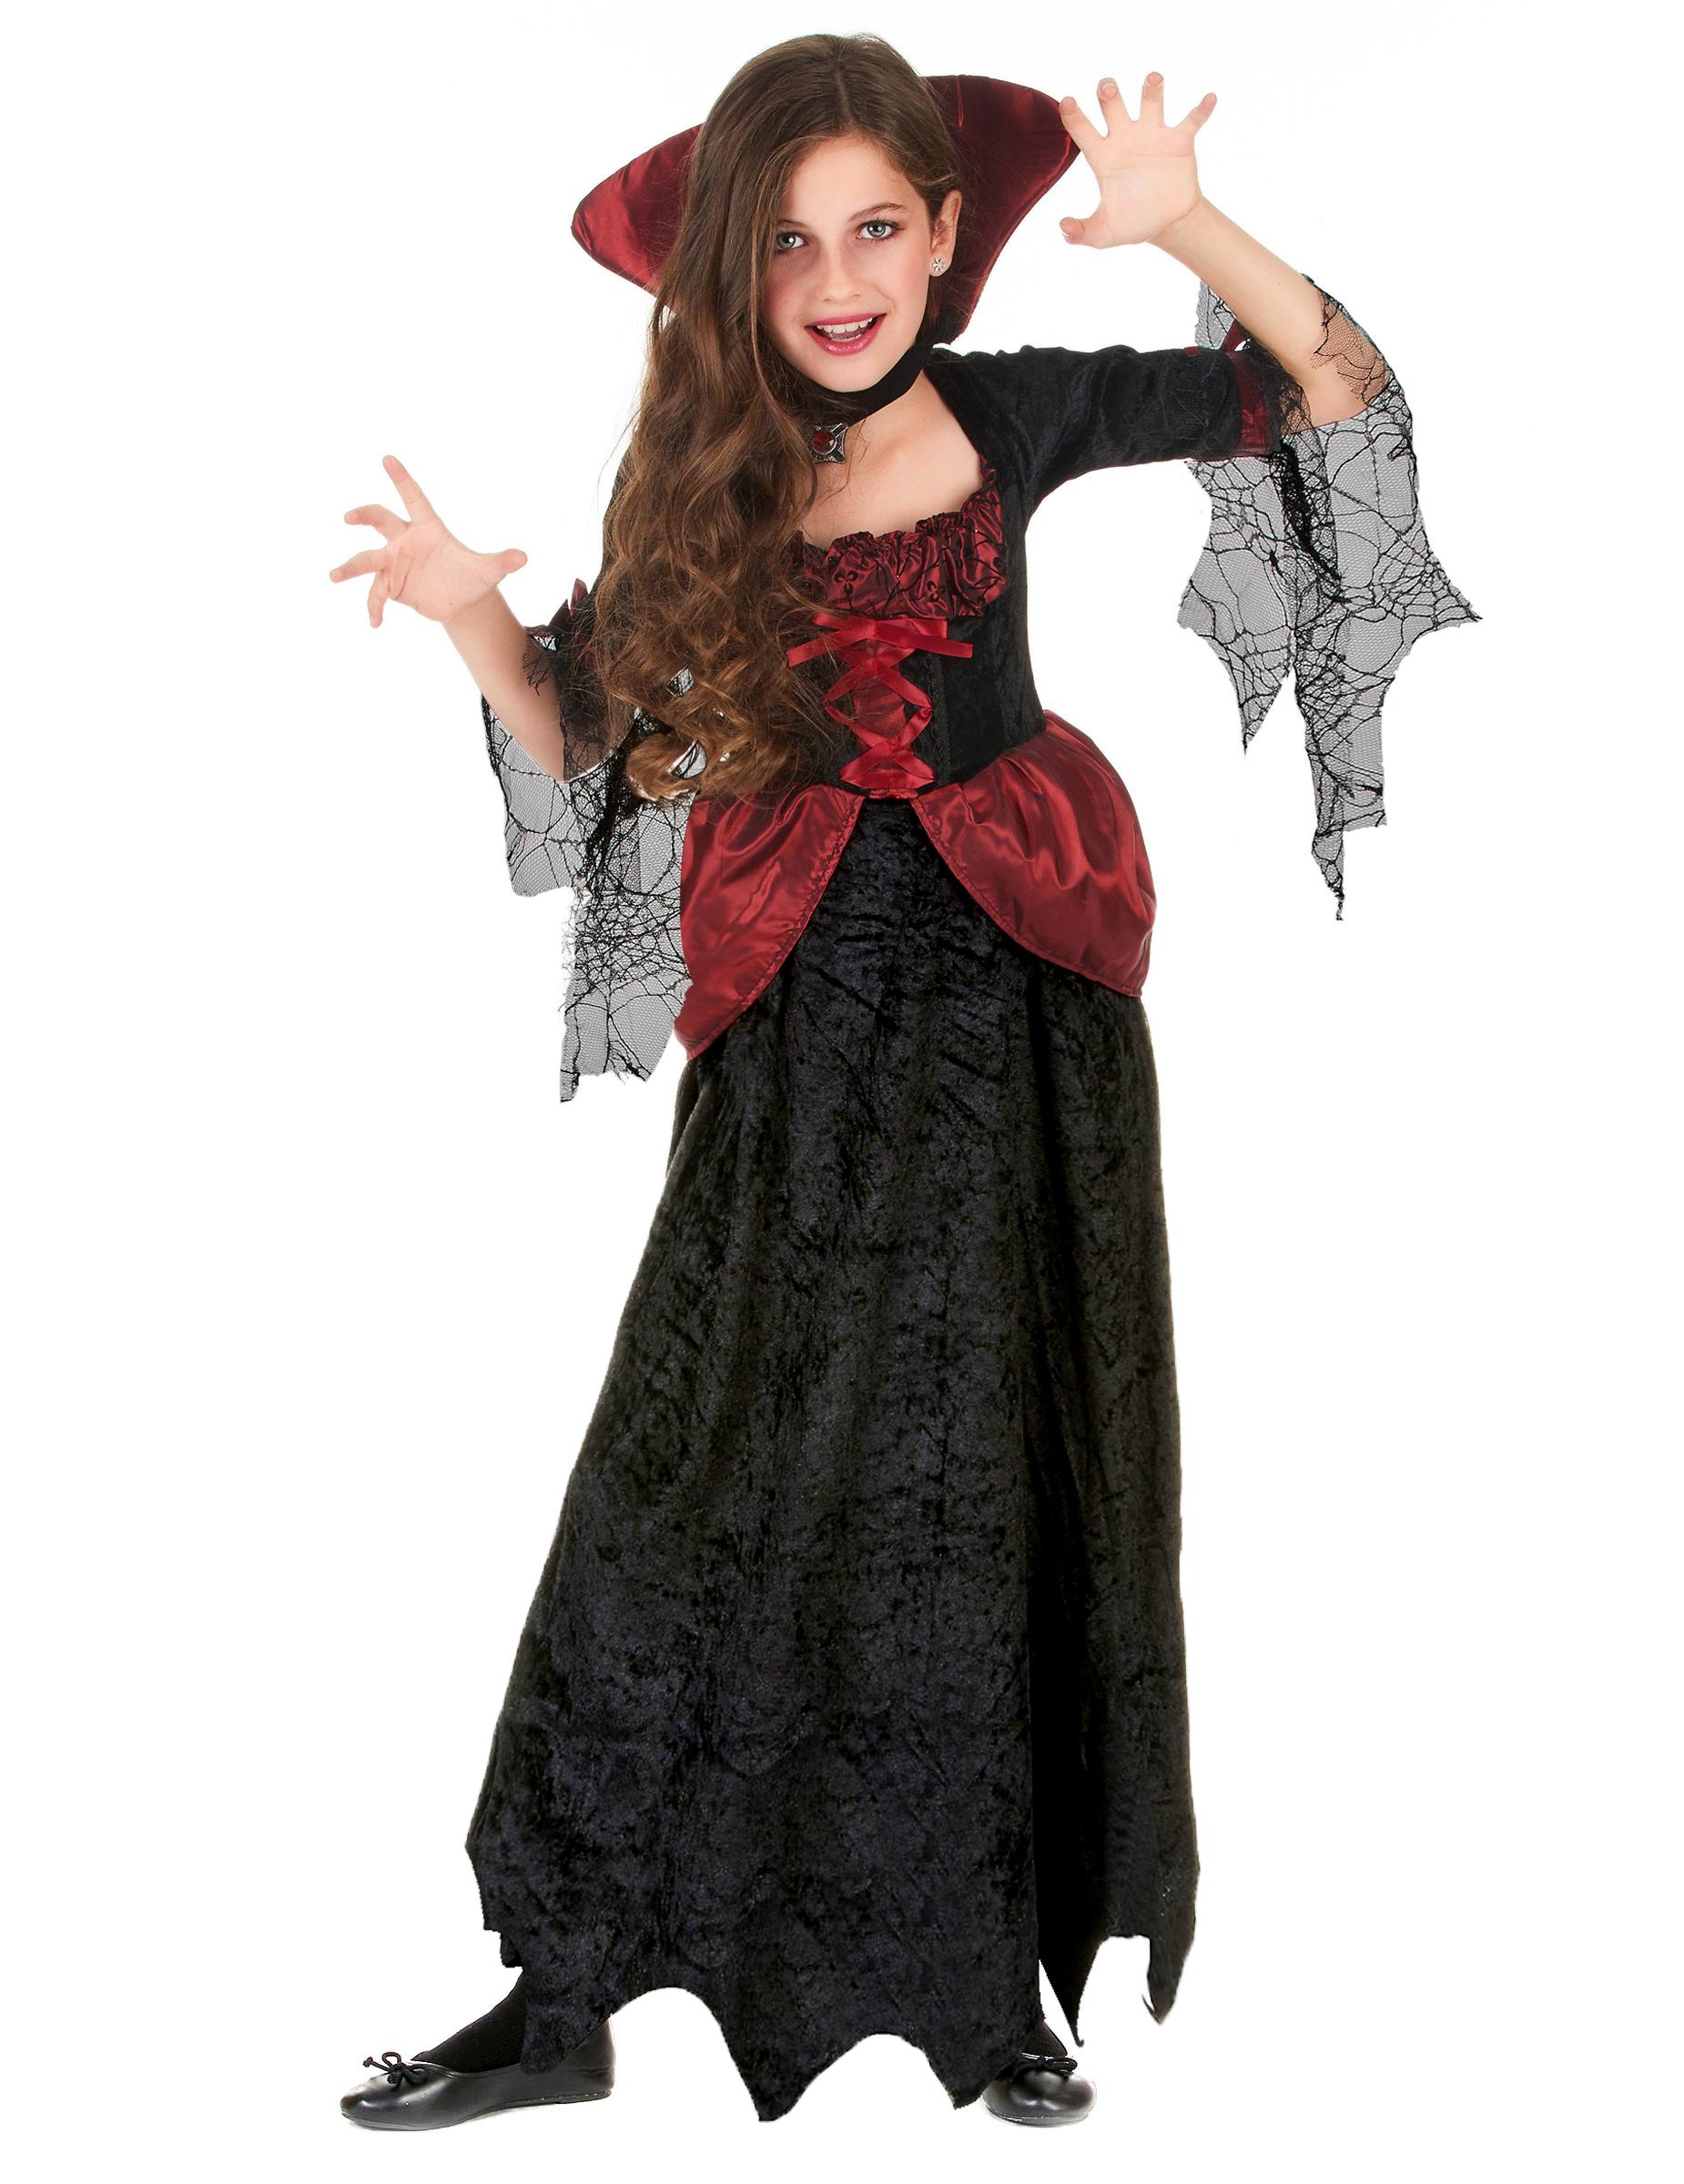 Costume vampira per bambina su VegaooParty b62a3eeb0aeb